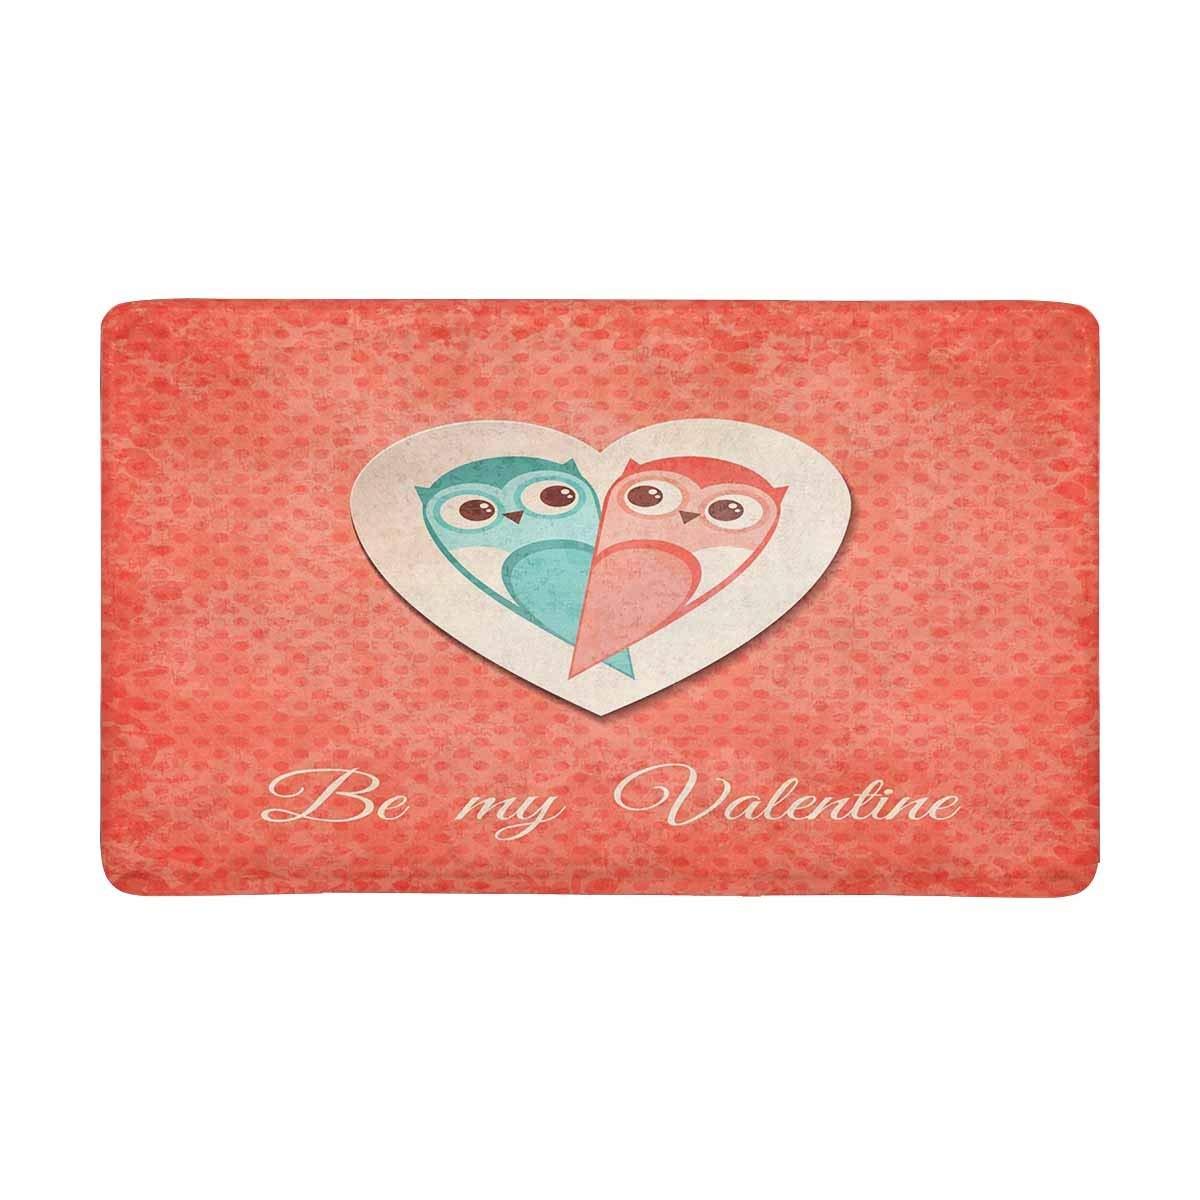 Valentine Card With Owls Indoor Entrance Doormat Non Slip Door Mat Entrance Rugs Home Decor